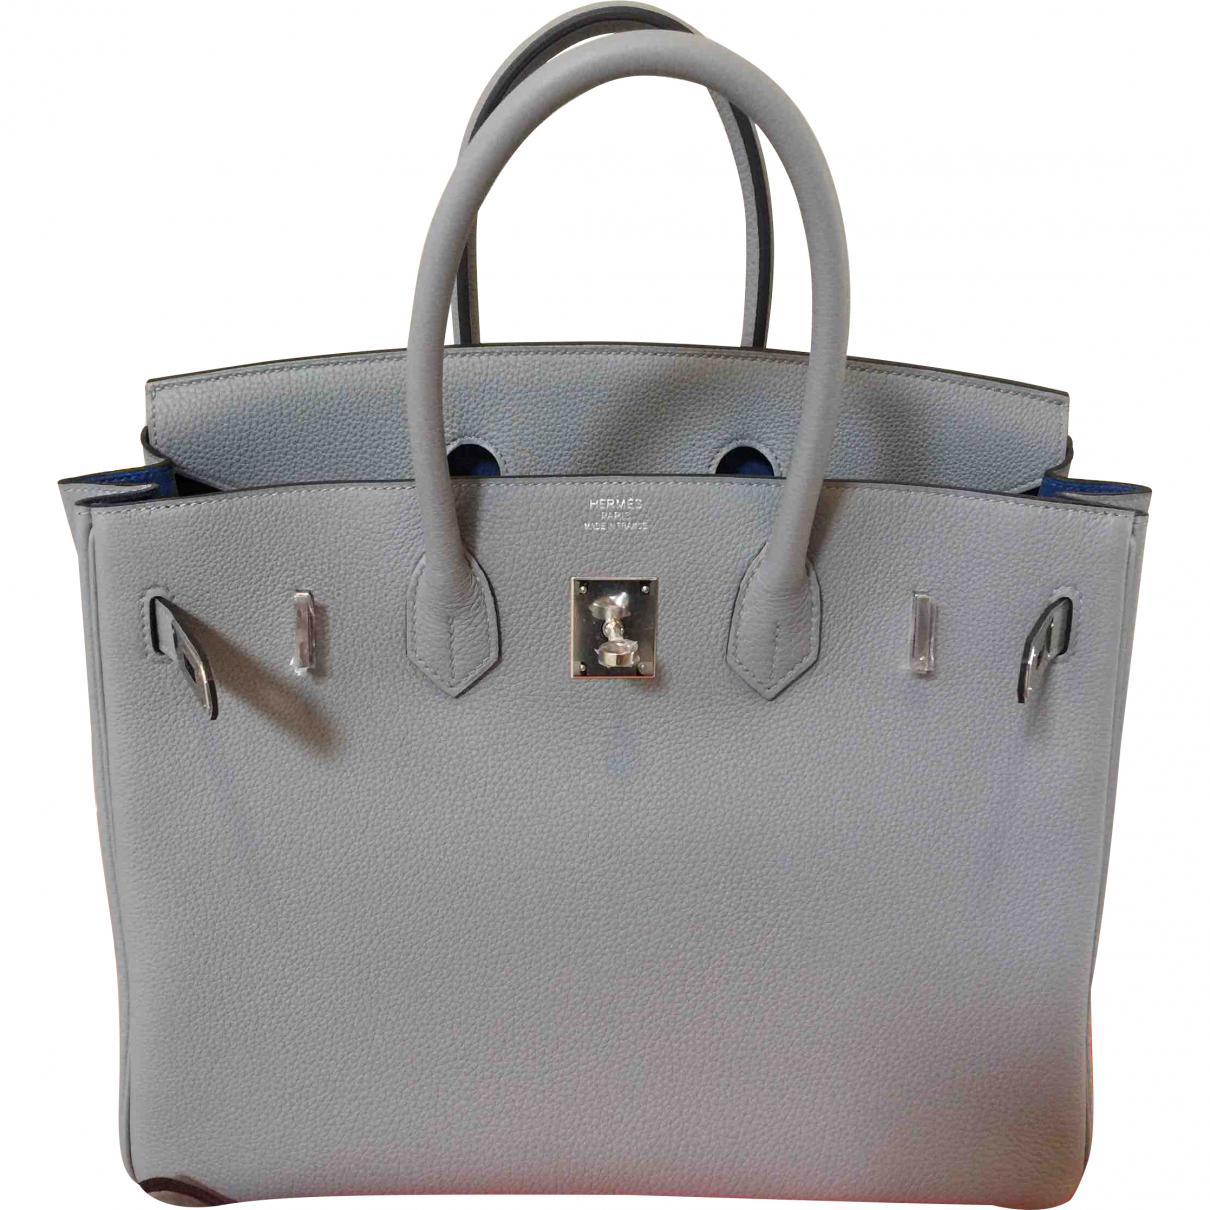 f79a179e36 Lyst - Hermès Birkin 35 Leather Bag in Gray